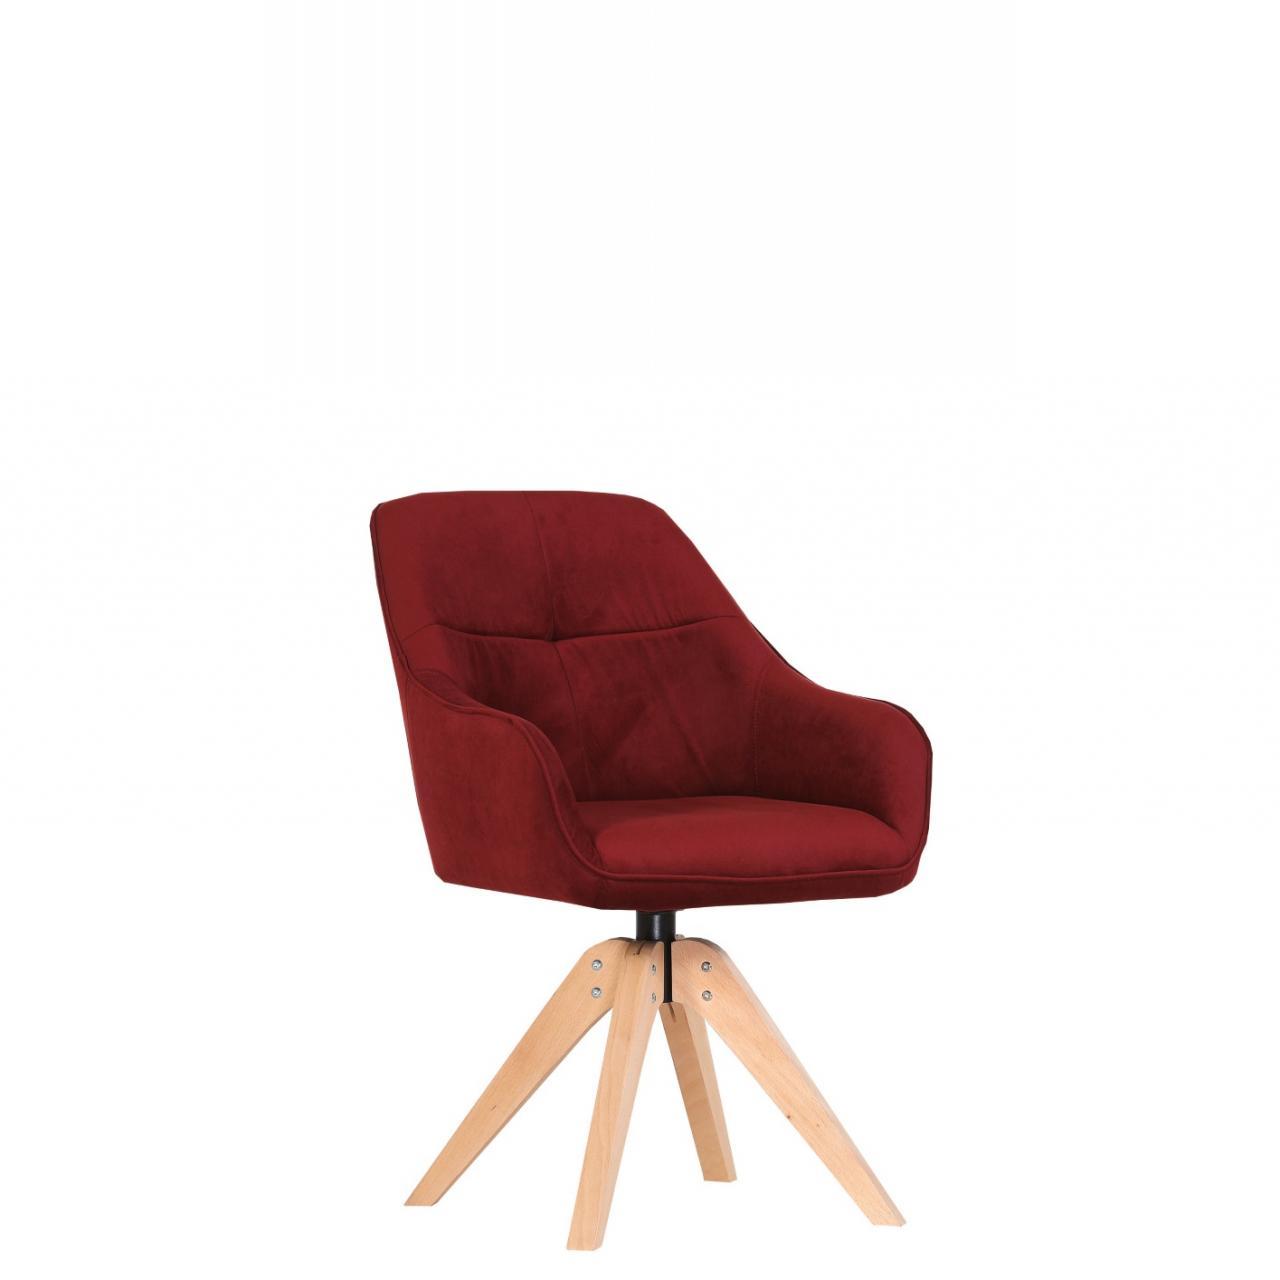 Drehsessel Lazy Rot Stoff Buche Massiv Natur Drehbar Küchenstuhl Stuhl Küche